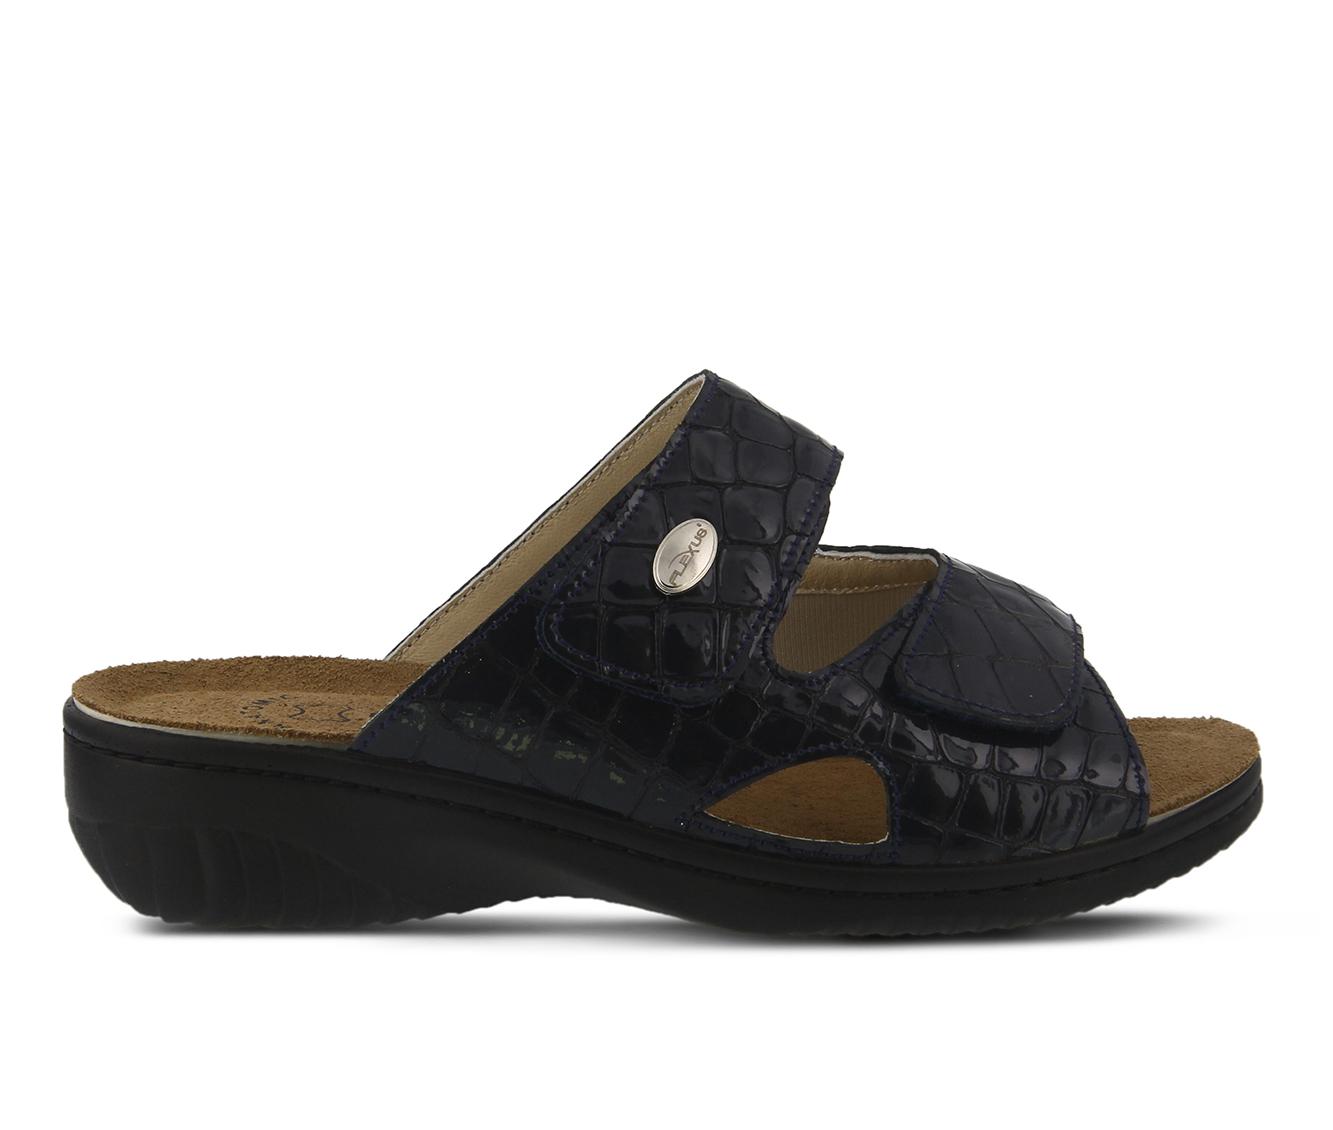 Flexus Almeria Women's Sandal (Blue Leather)